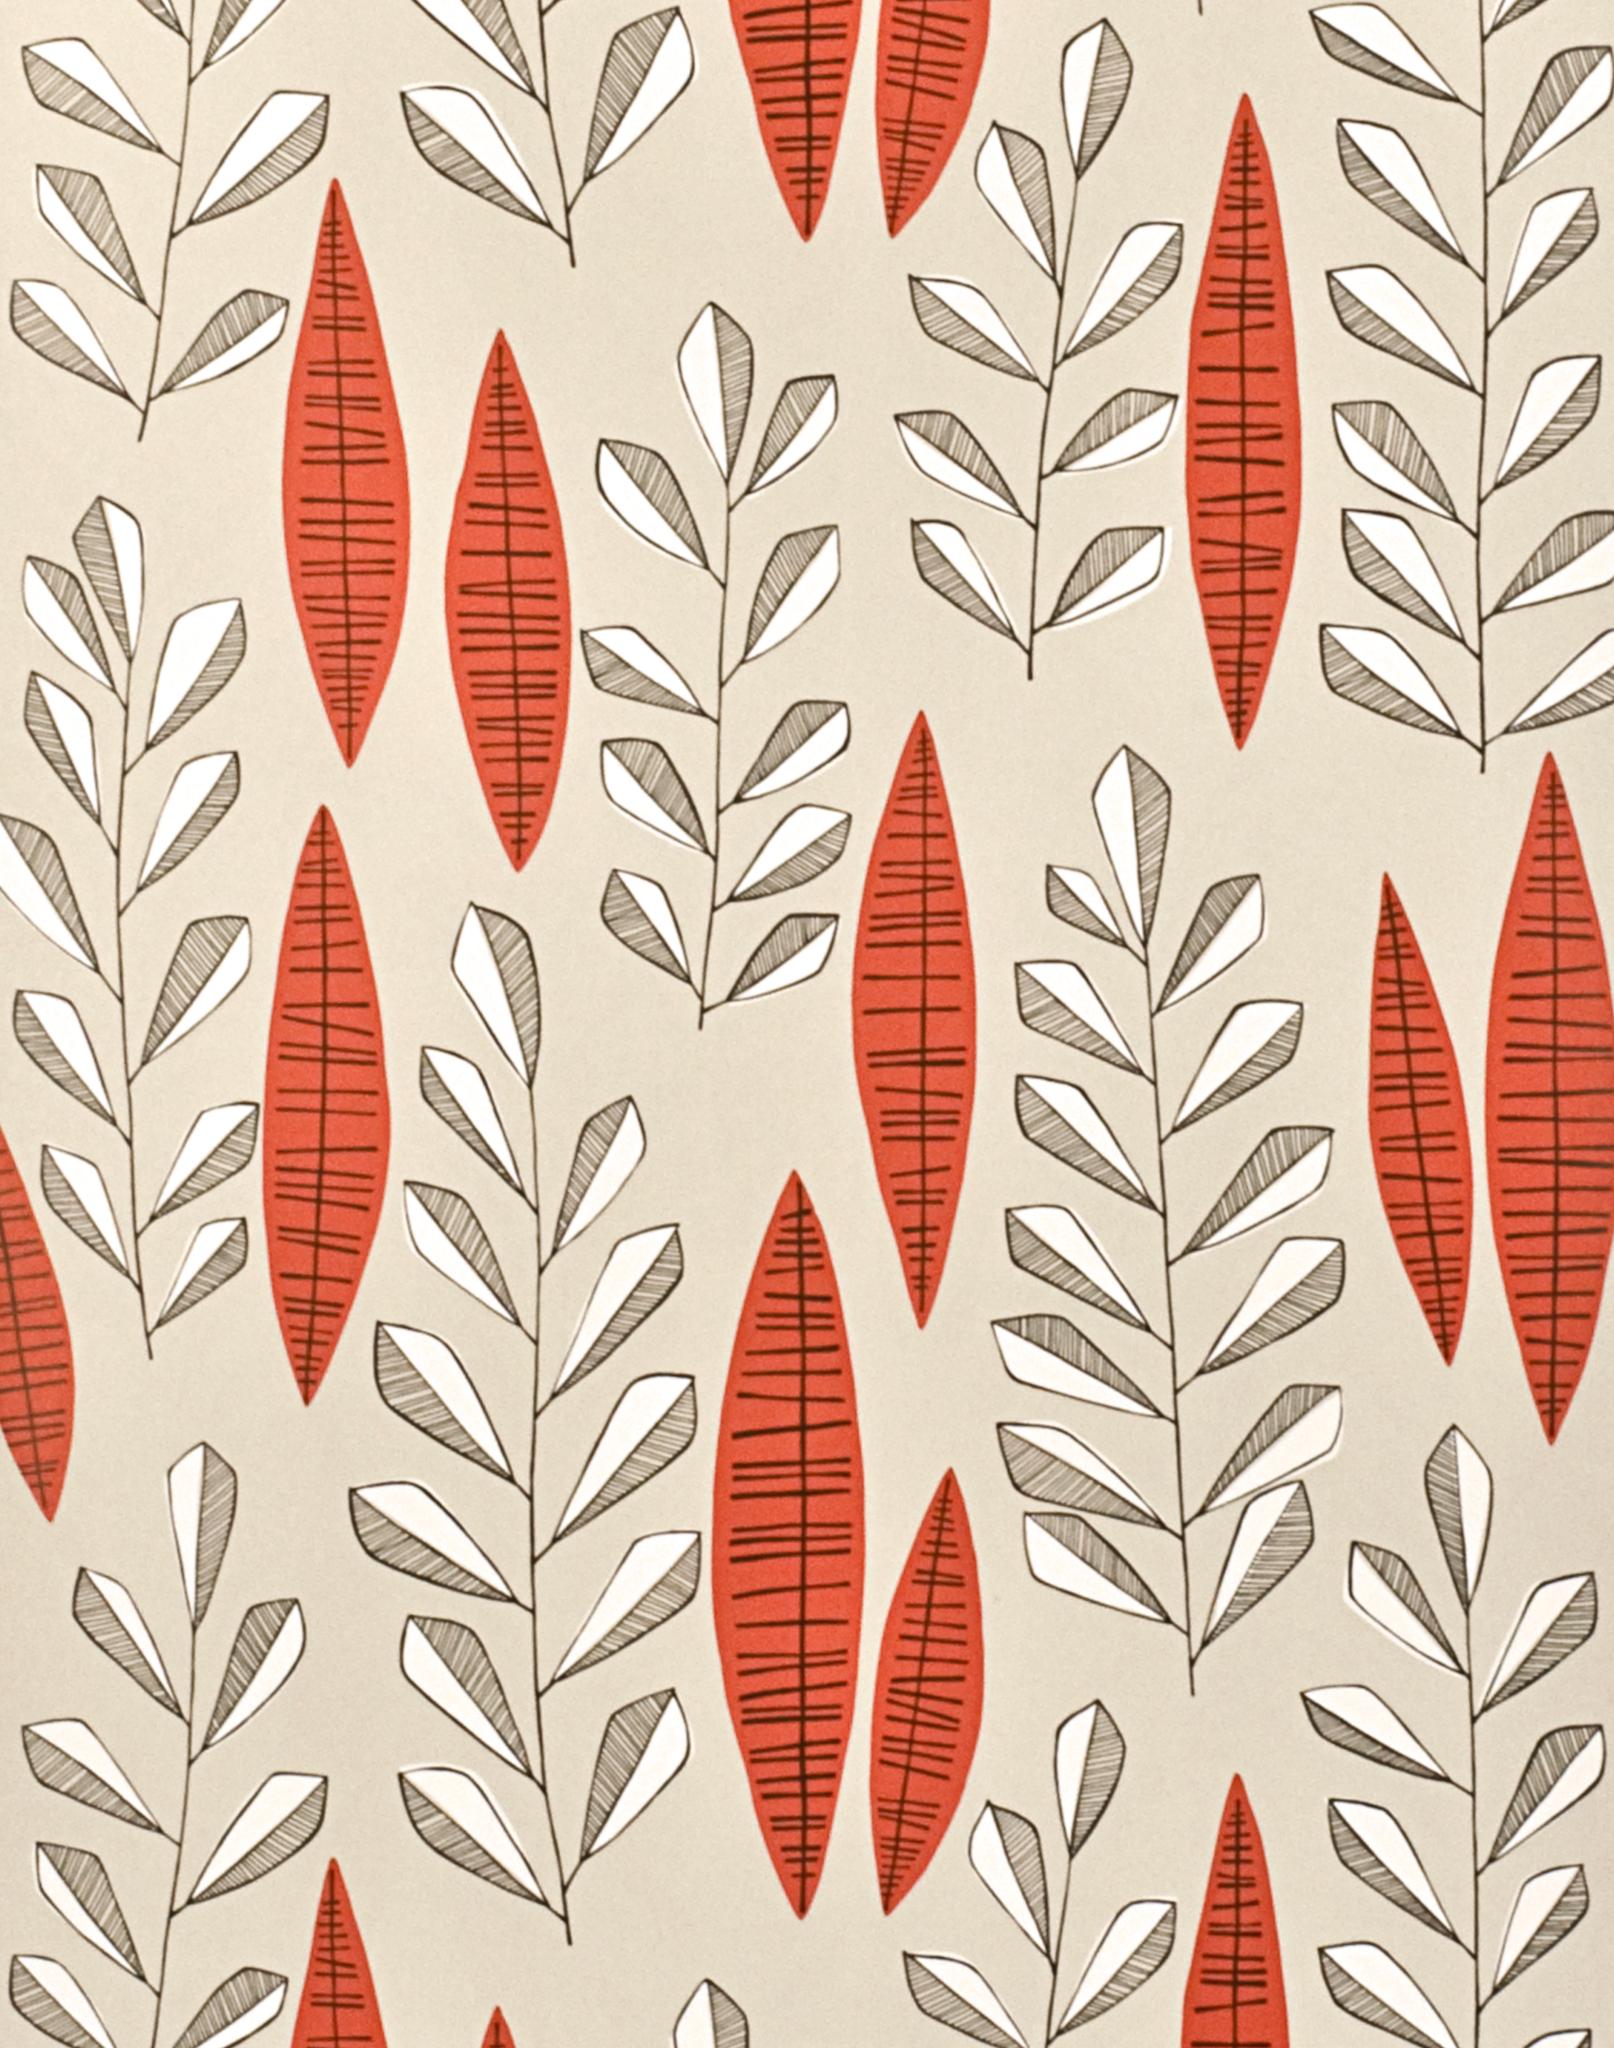 Garden City Putty Rouge Retro Tapet Pattern Wallpaper City Wallpaper